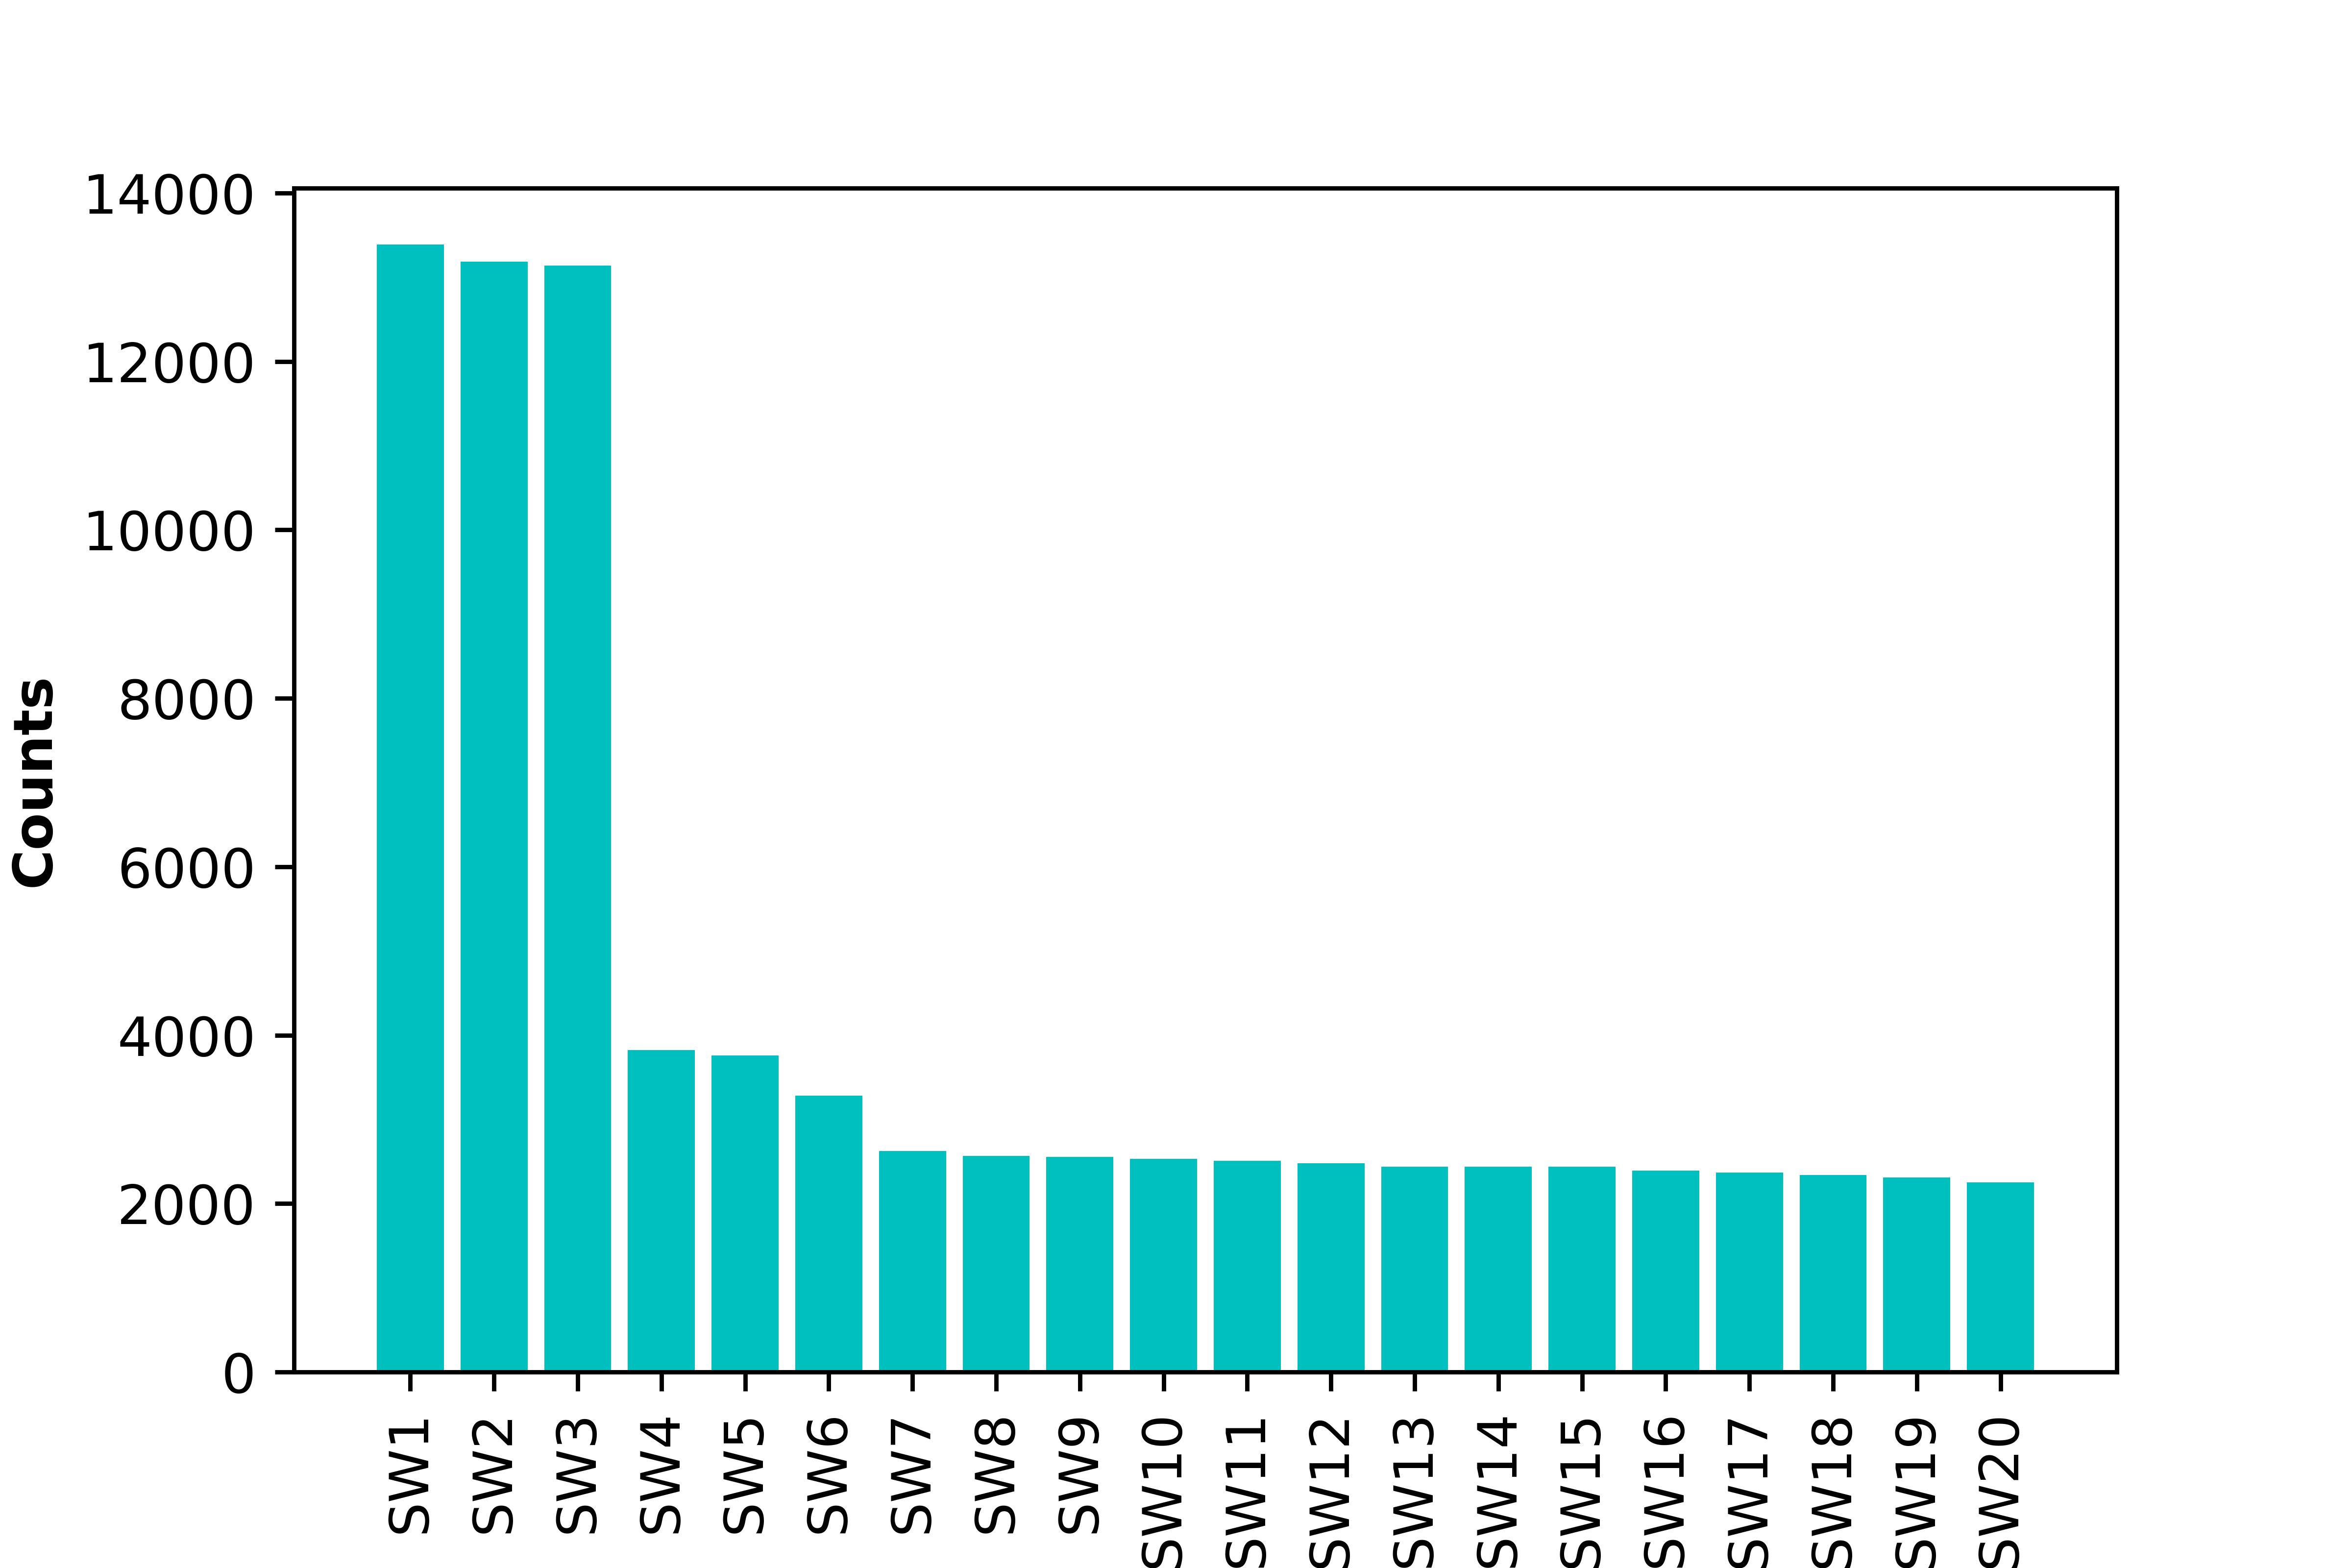 UCI_Data/lda/SWE_Random_Combinaitions/plots_m5/sw_distribution_m5.png